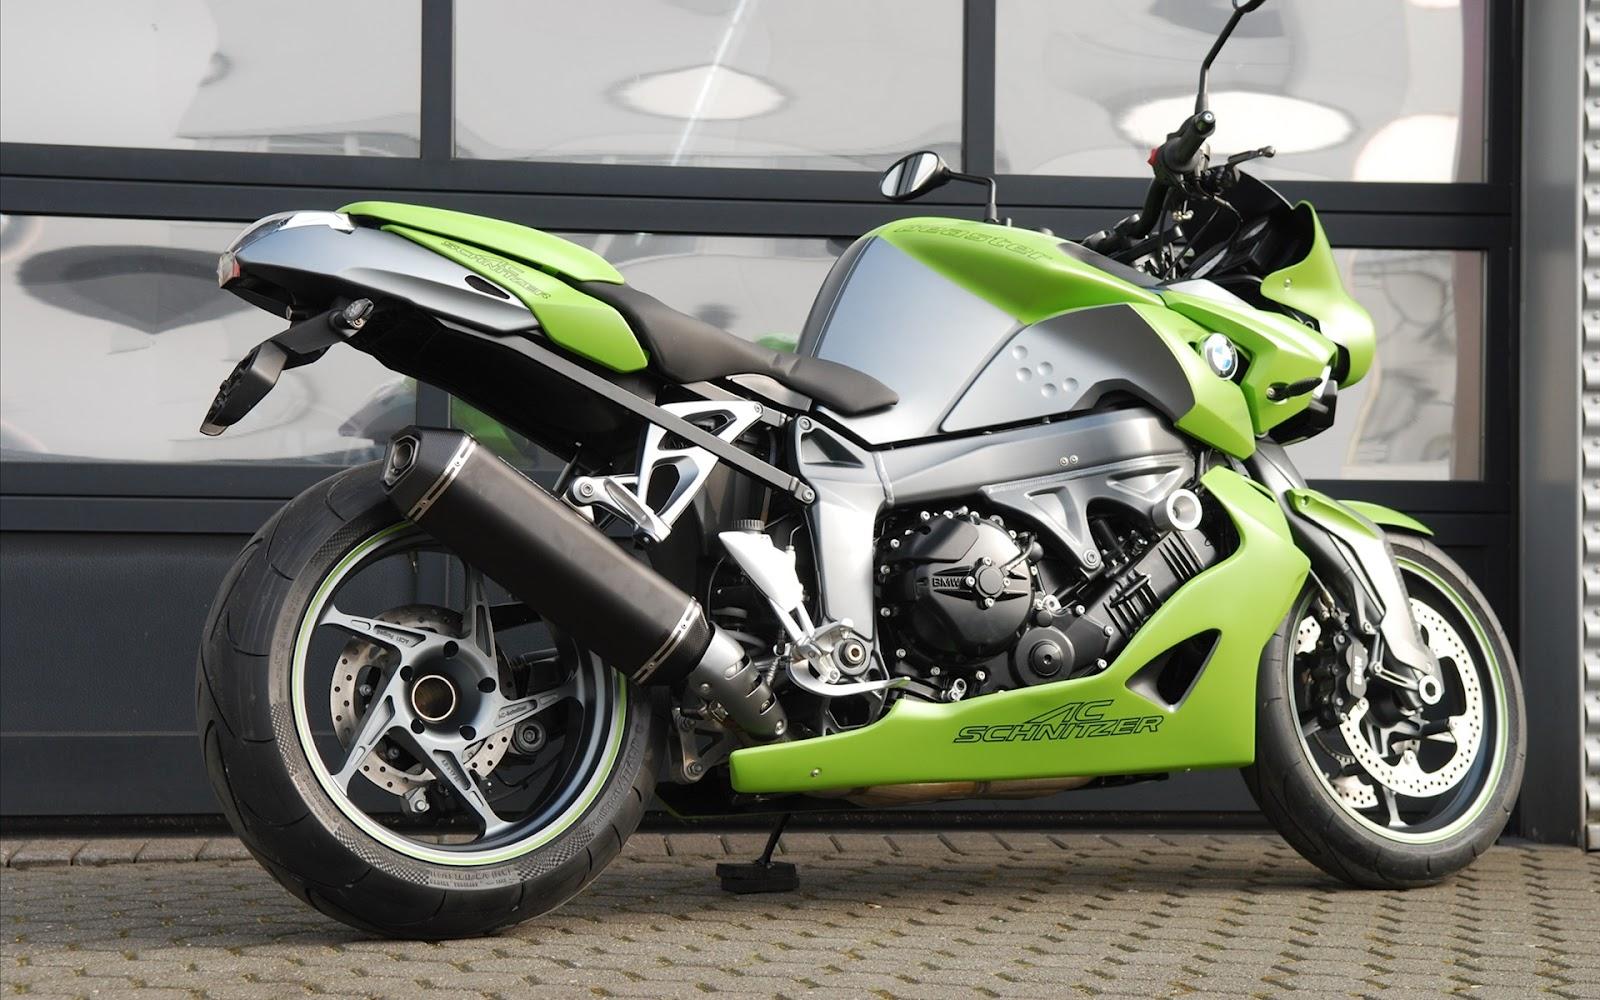 speedy bikes new latese bmw k1300r. Black Bedroom Furniture Sets. Home Design Ideas